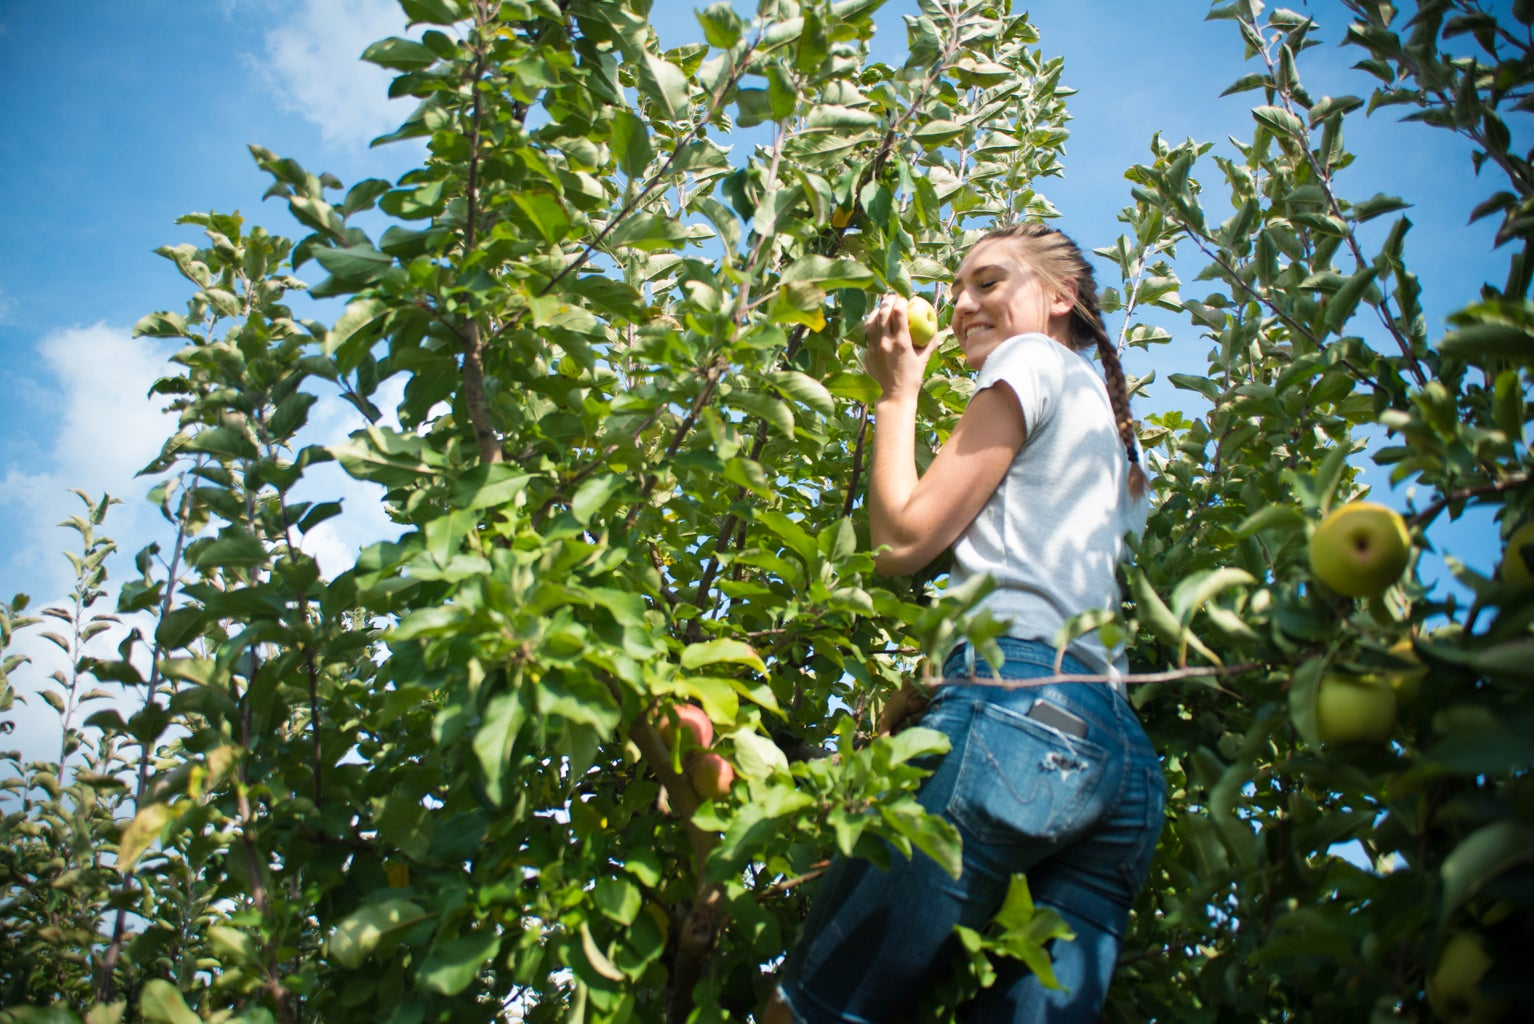 Apple Orchard Girl Picking Apples